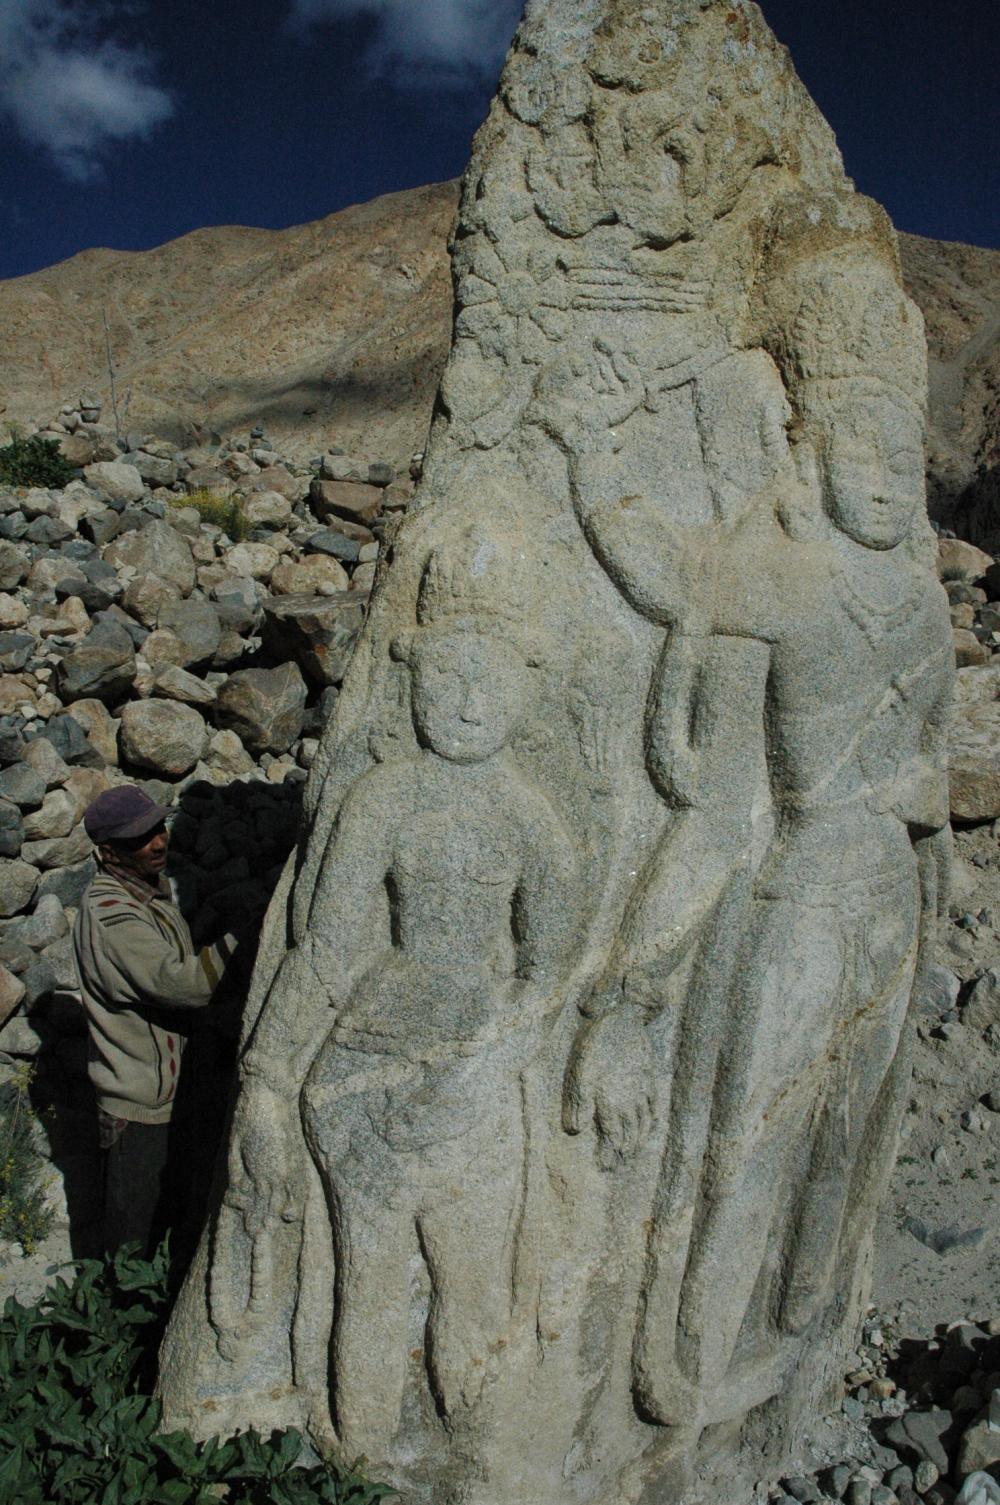 Fig. 5. The rocksculpturein Digar village of Nubra valleyis the largest in the Leh district (Courtesy: Tashi Morup, 2004)